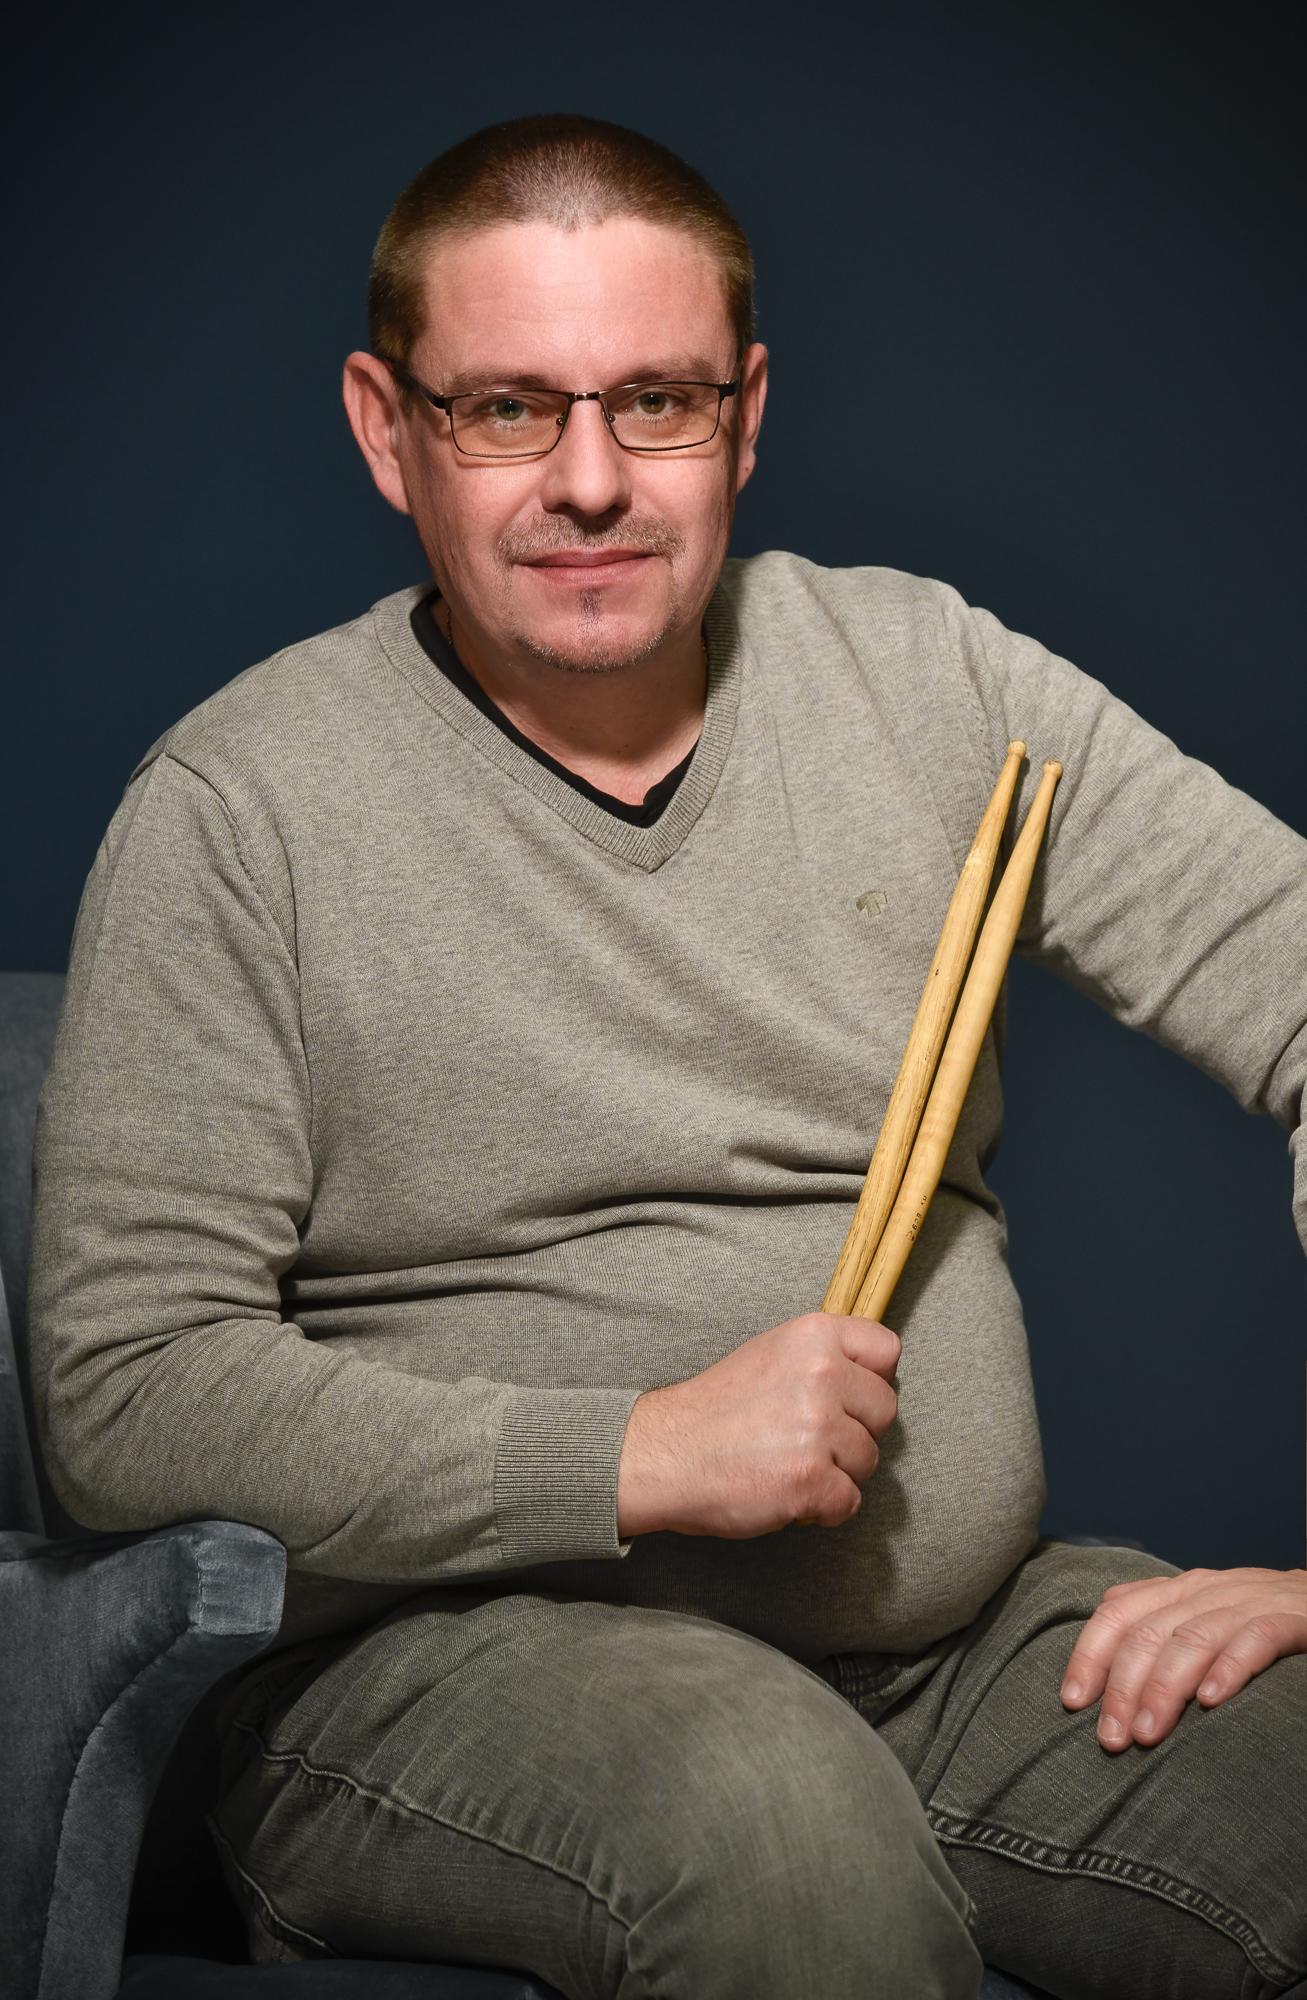 Tomáš Rolek